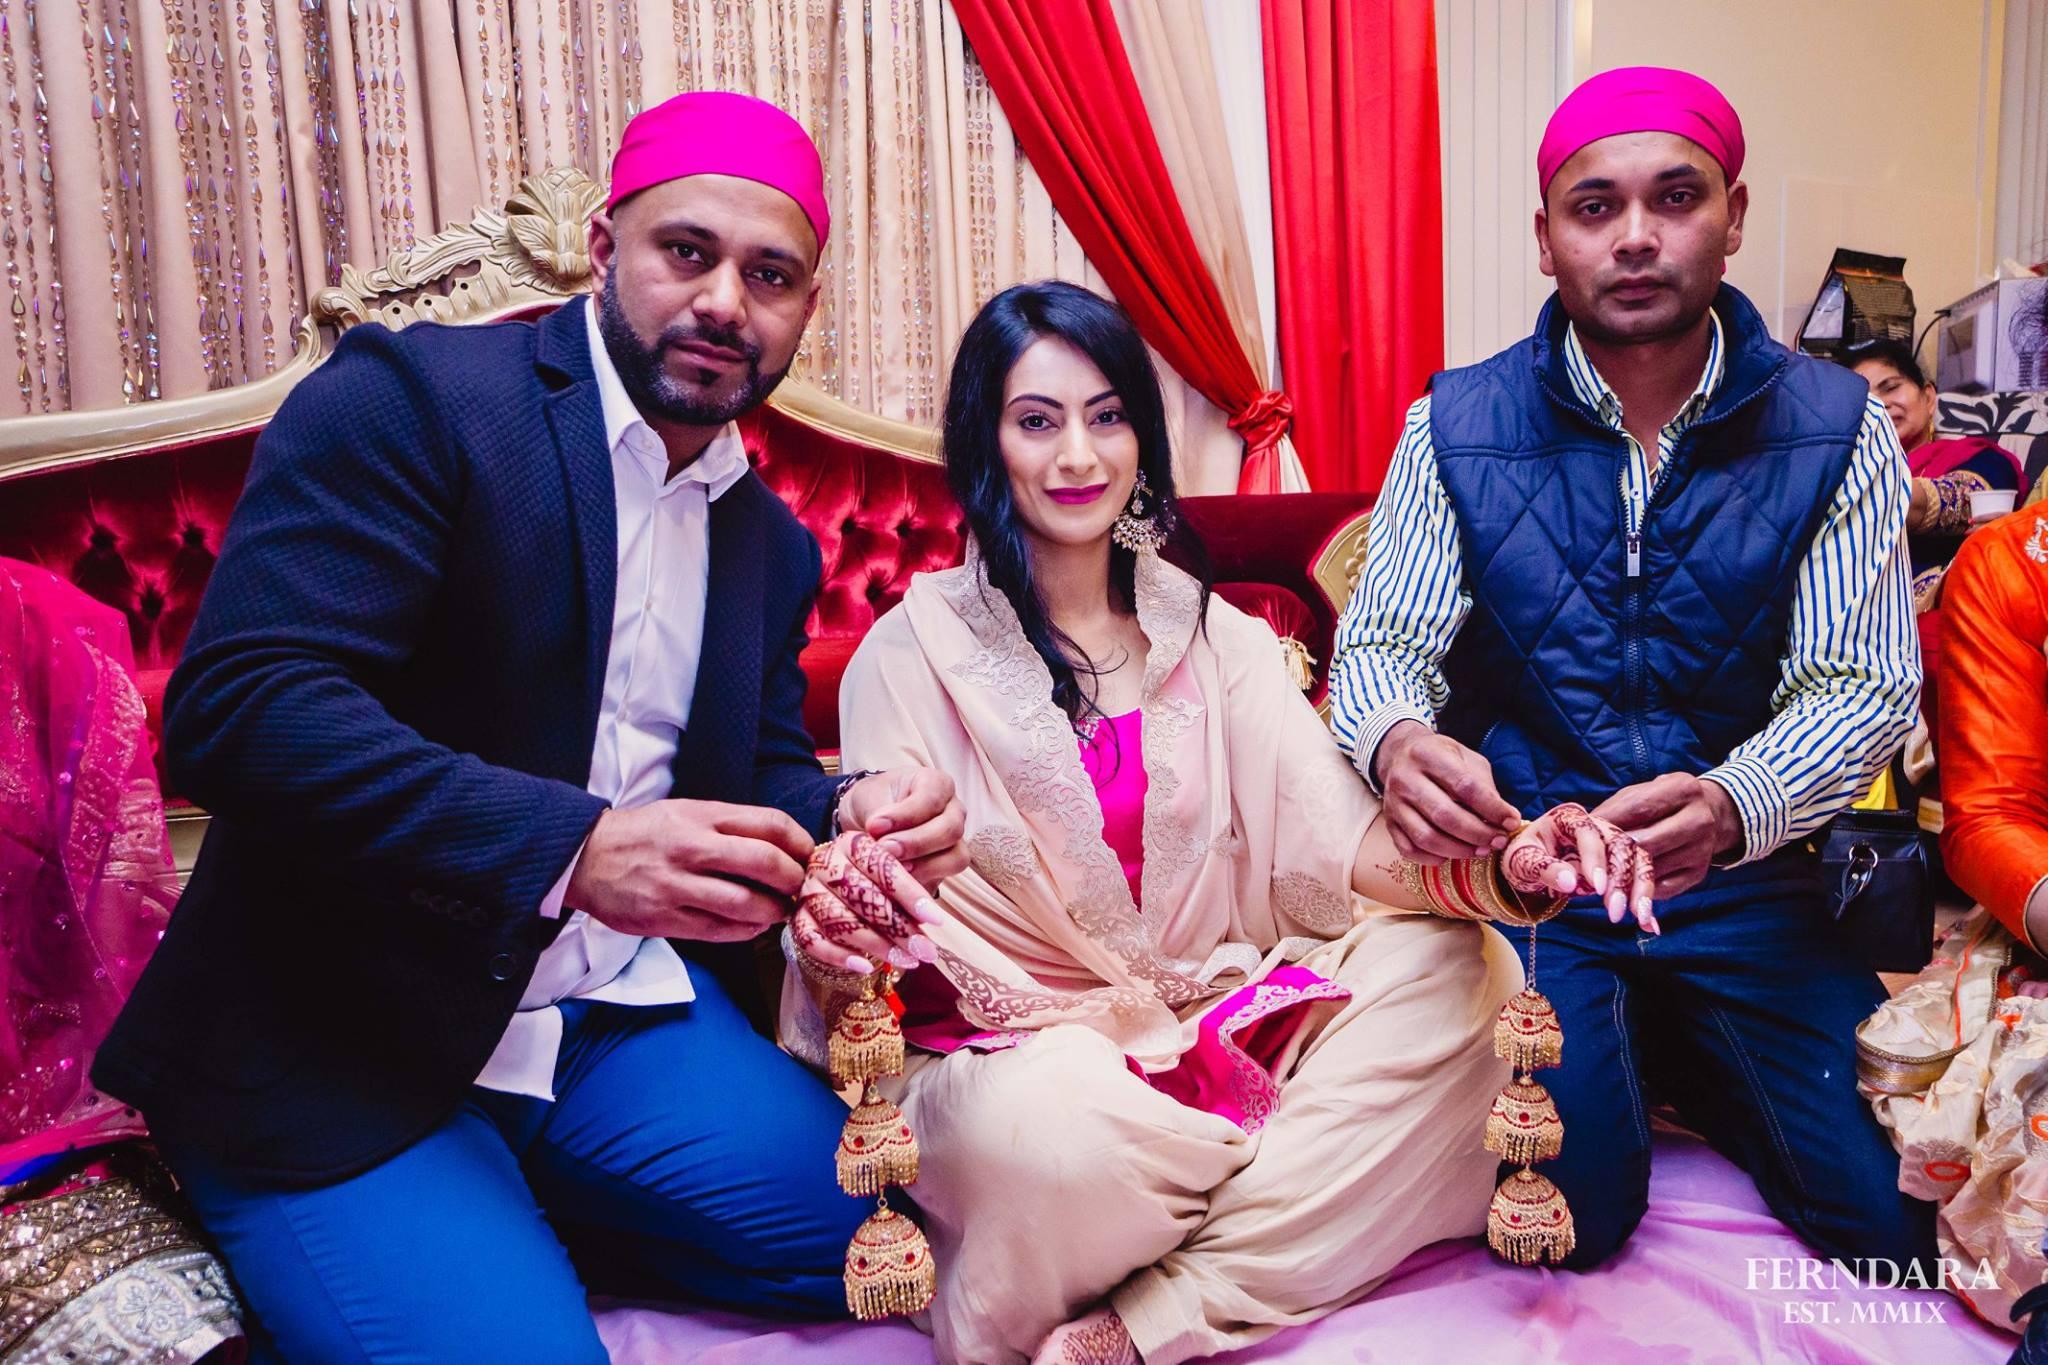 , Jaspreet + Amar, Ferndara, Ferndara